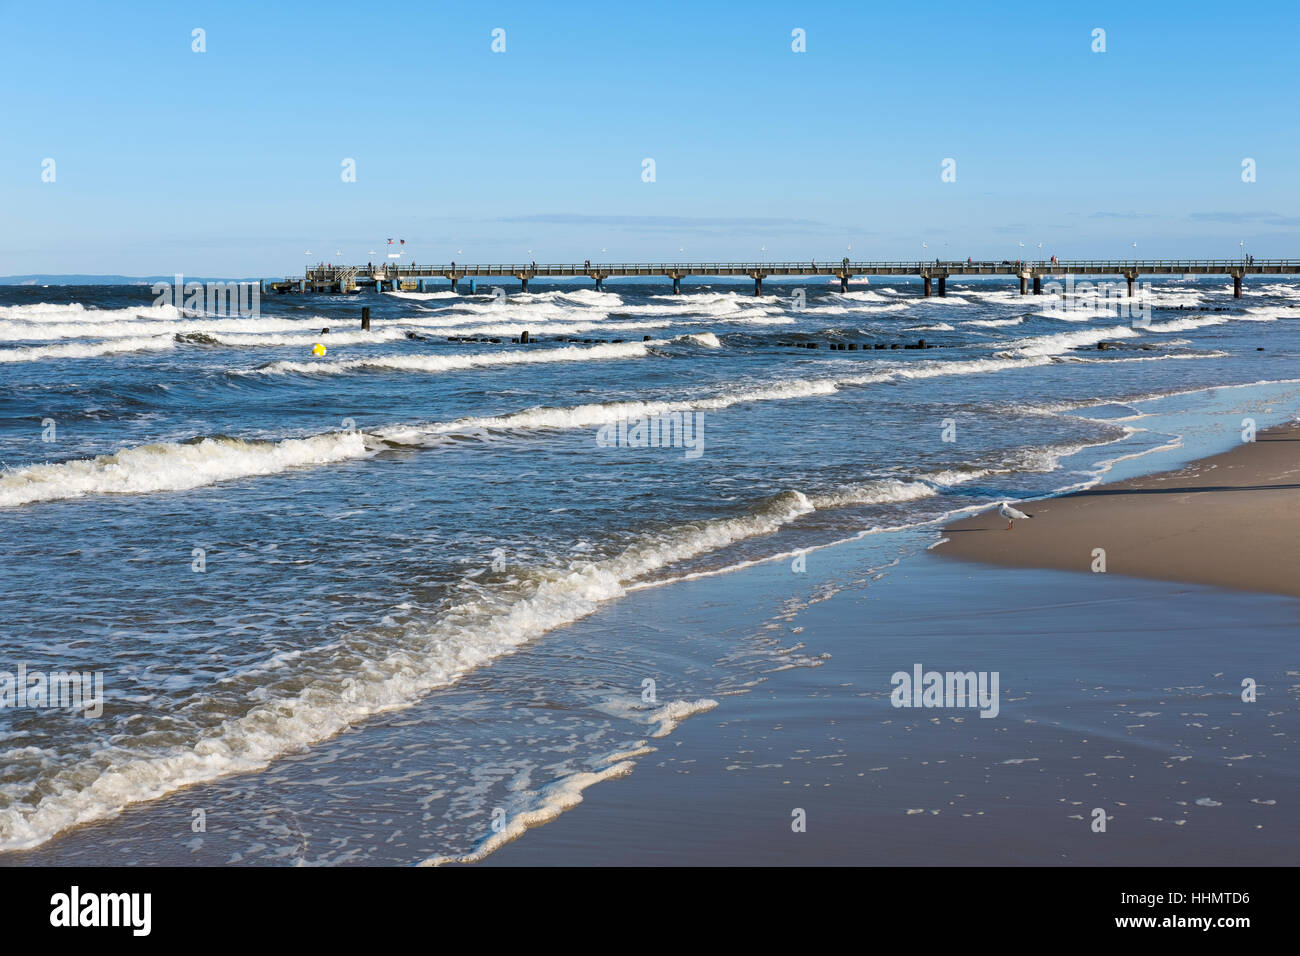 Pier at Seebad Bansin, seaside resort, Usedom, Mecklenburg-Western Pomerania, Germany - Stock Image